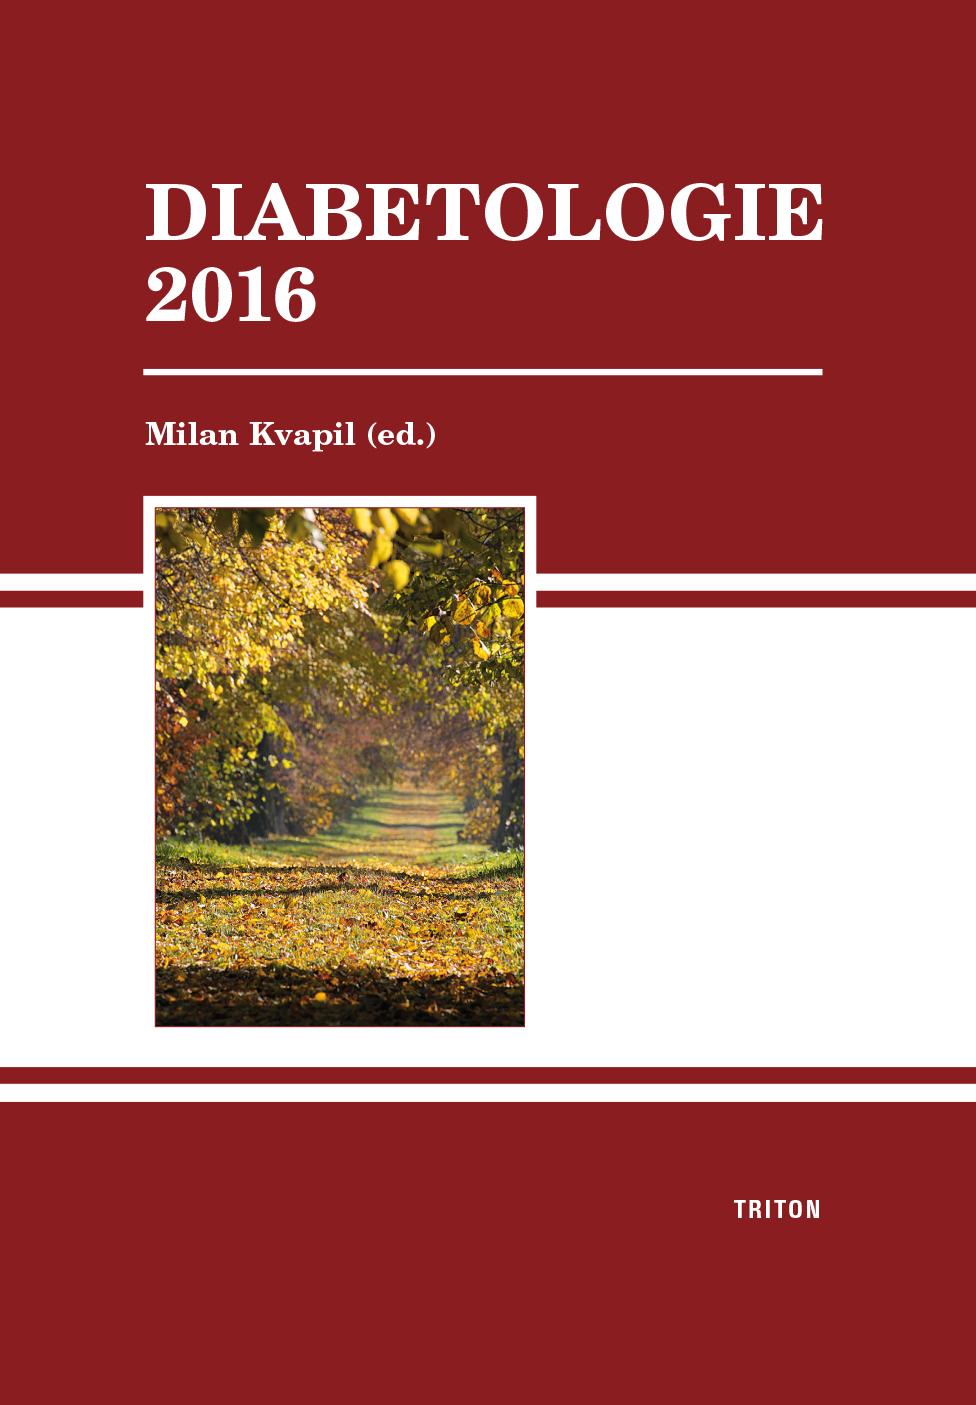 Diabetologie 2016